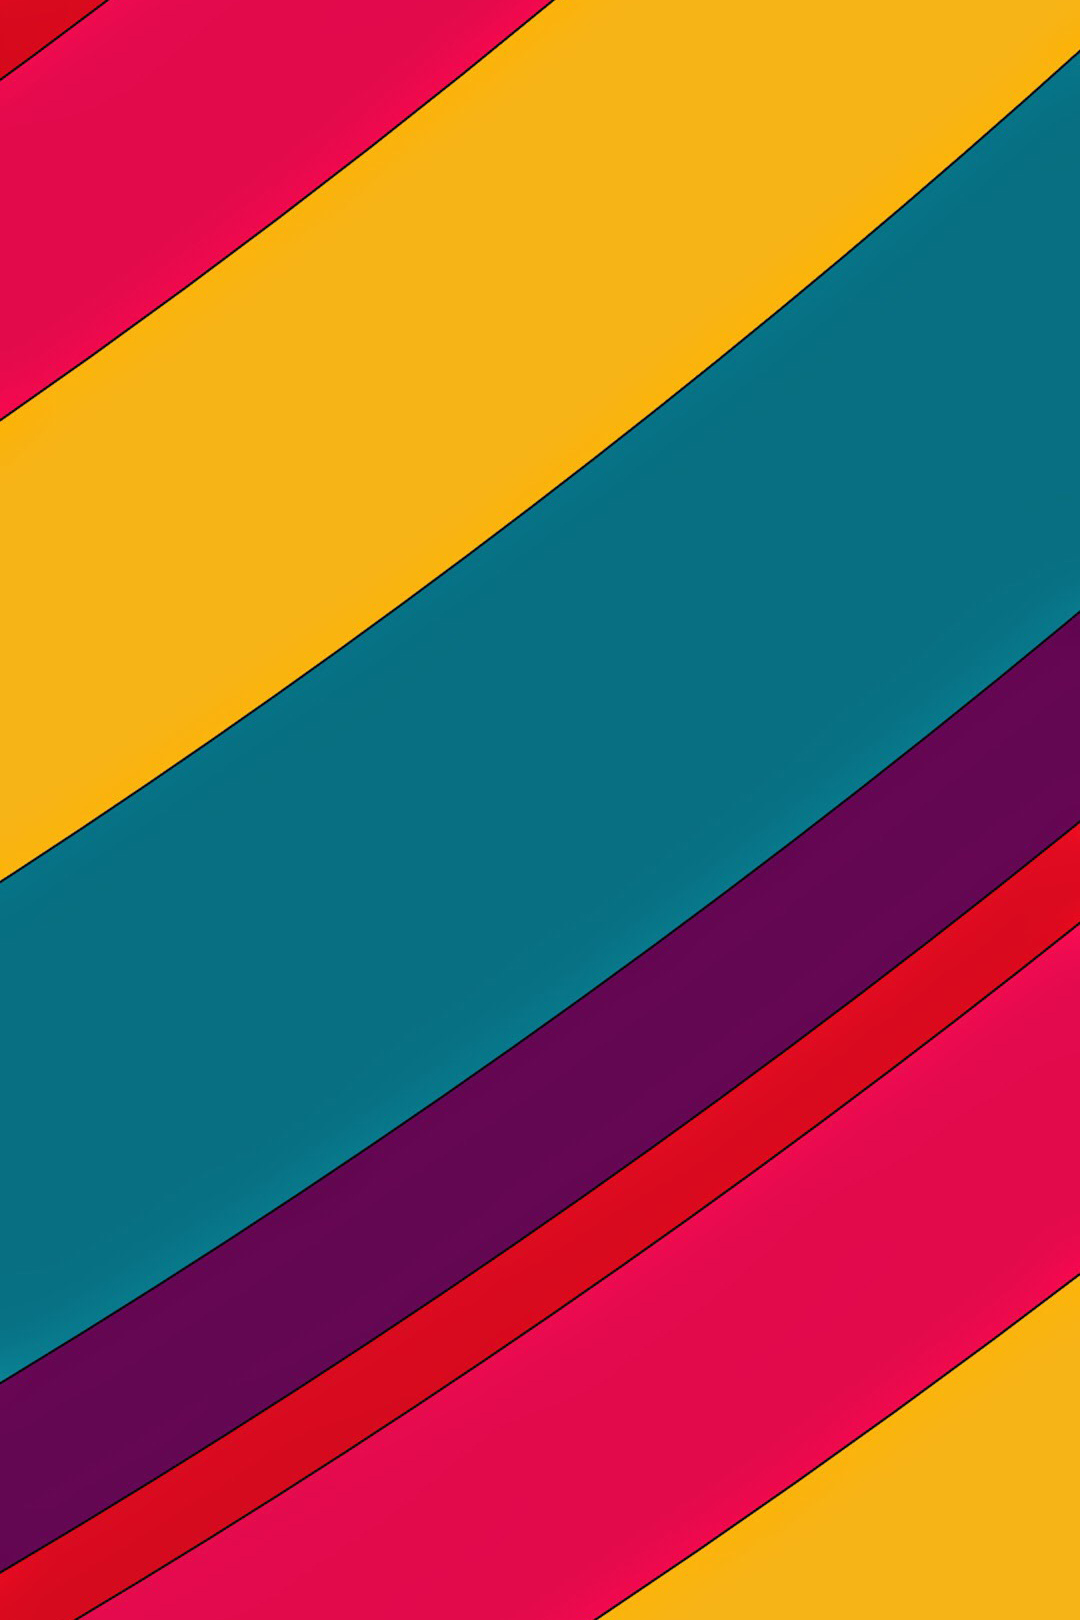 Wallpaperoftheweek 81 scarica gratis due nuovi sfondi for Sfondi per desktop colorati